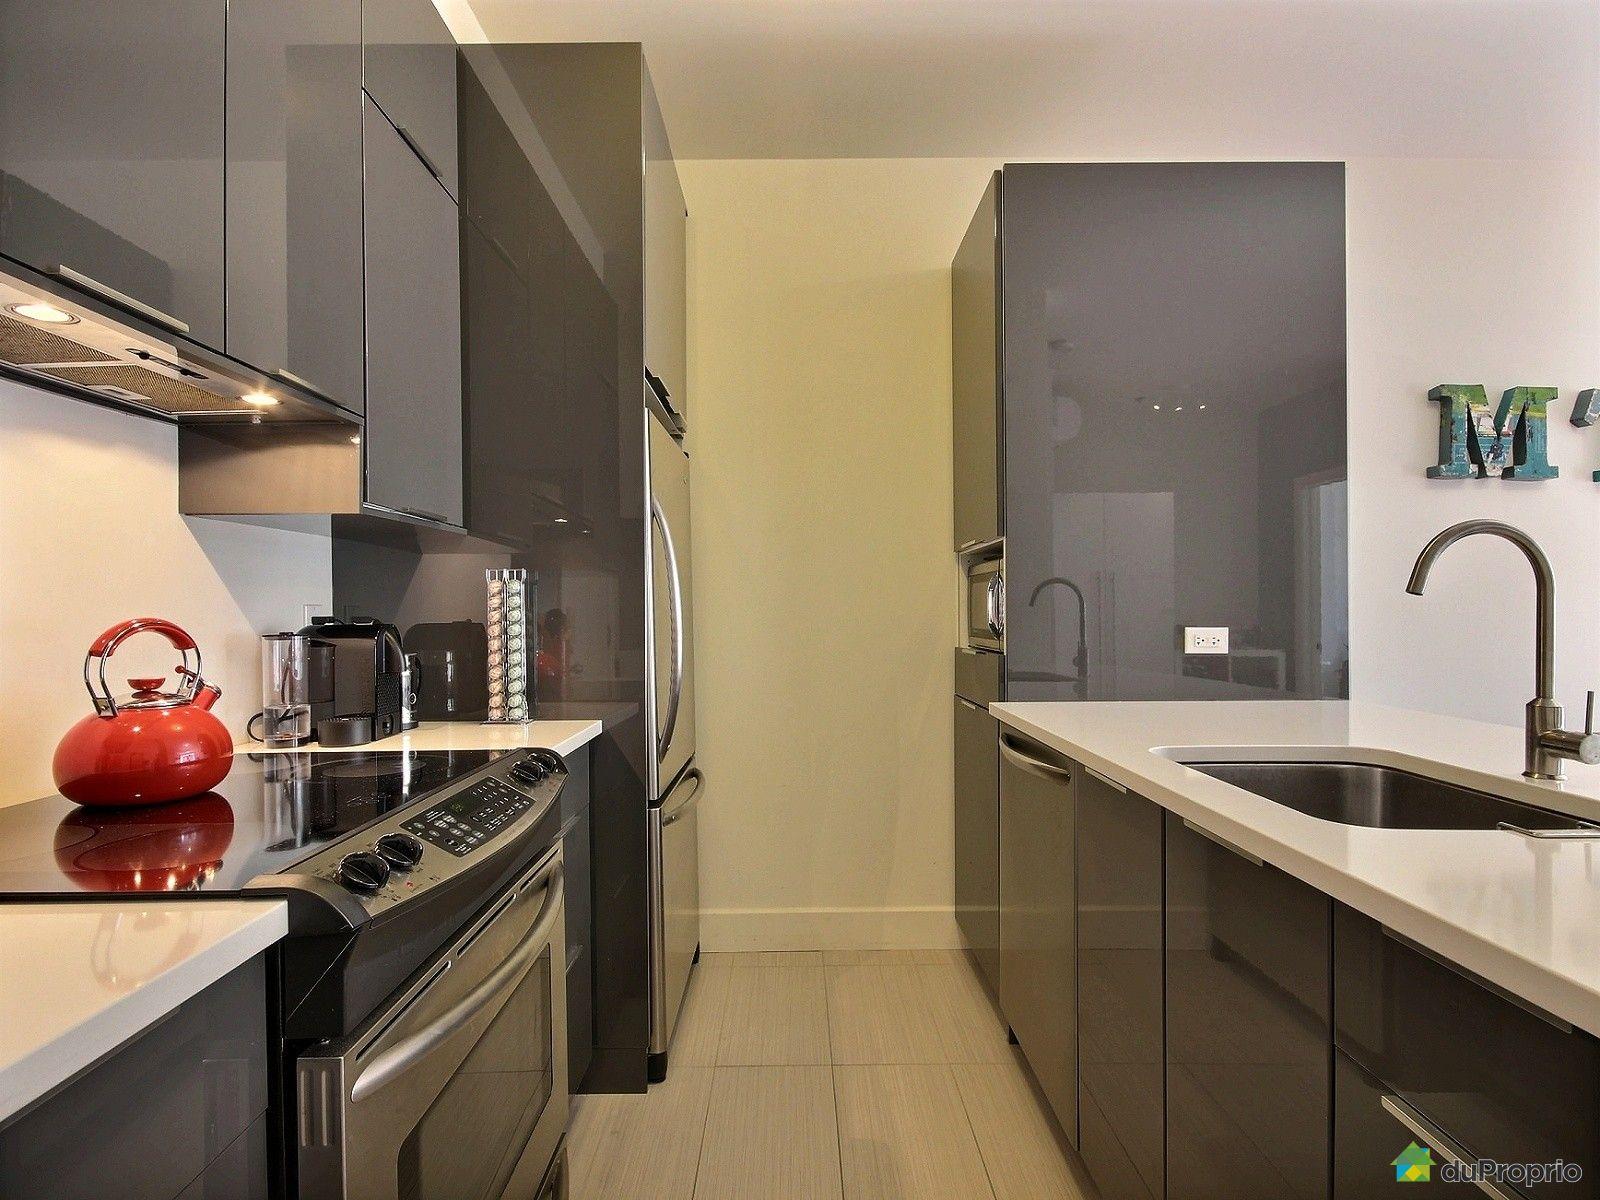 Condo vendu montr al immobilier qu bec duproprio 361752 for Cuisine ouverte tard montreal